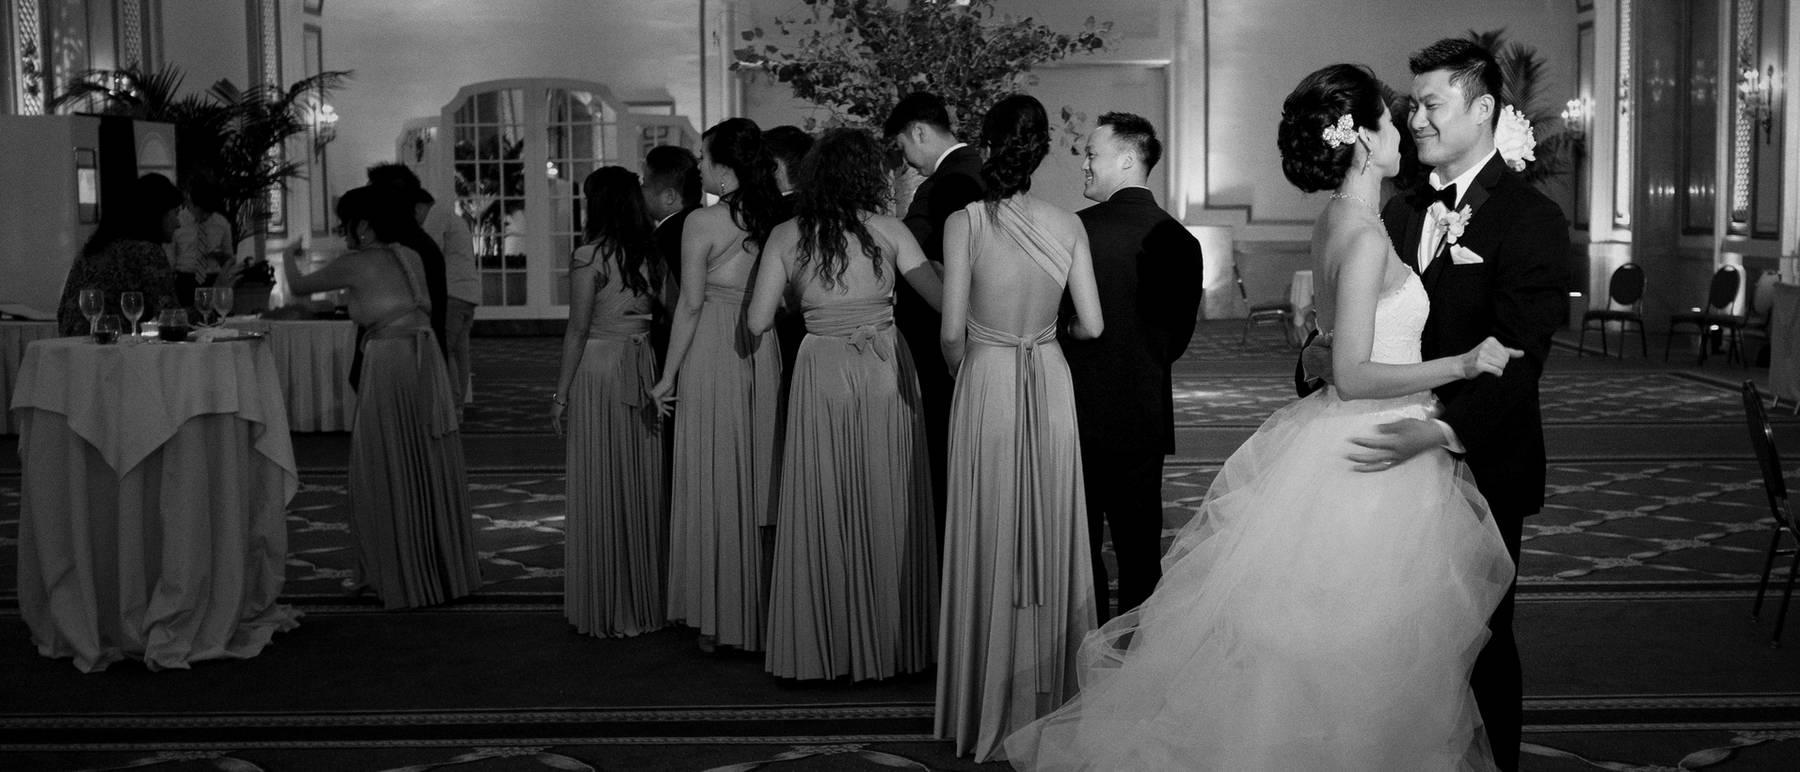 johnandjoseph-wedding-photographer-hz-slider-310